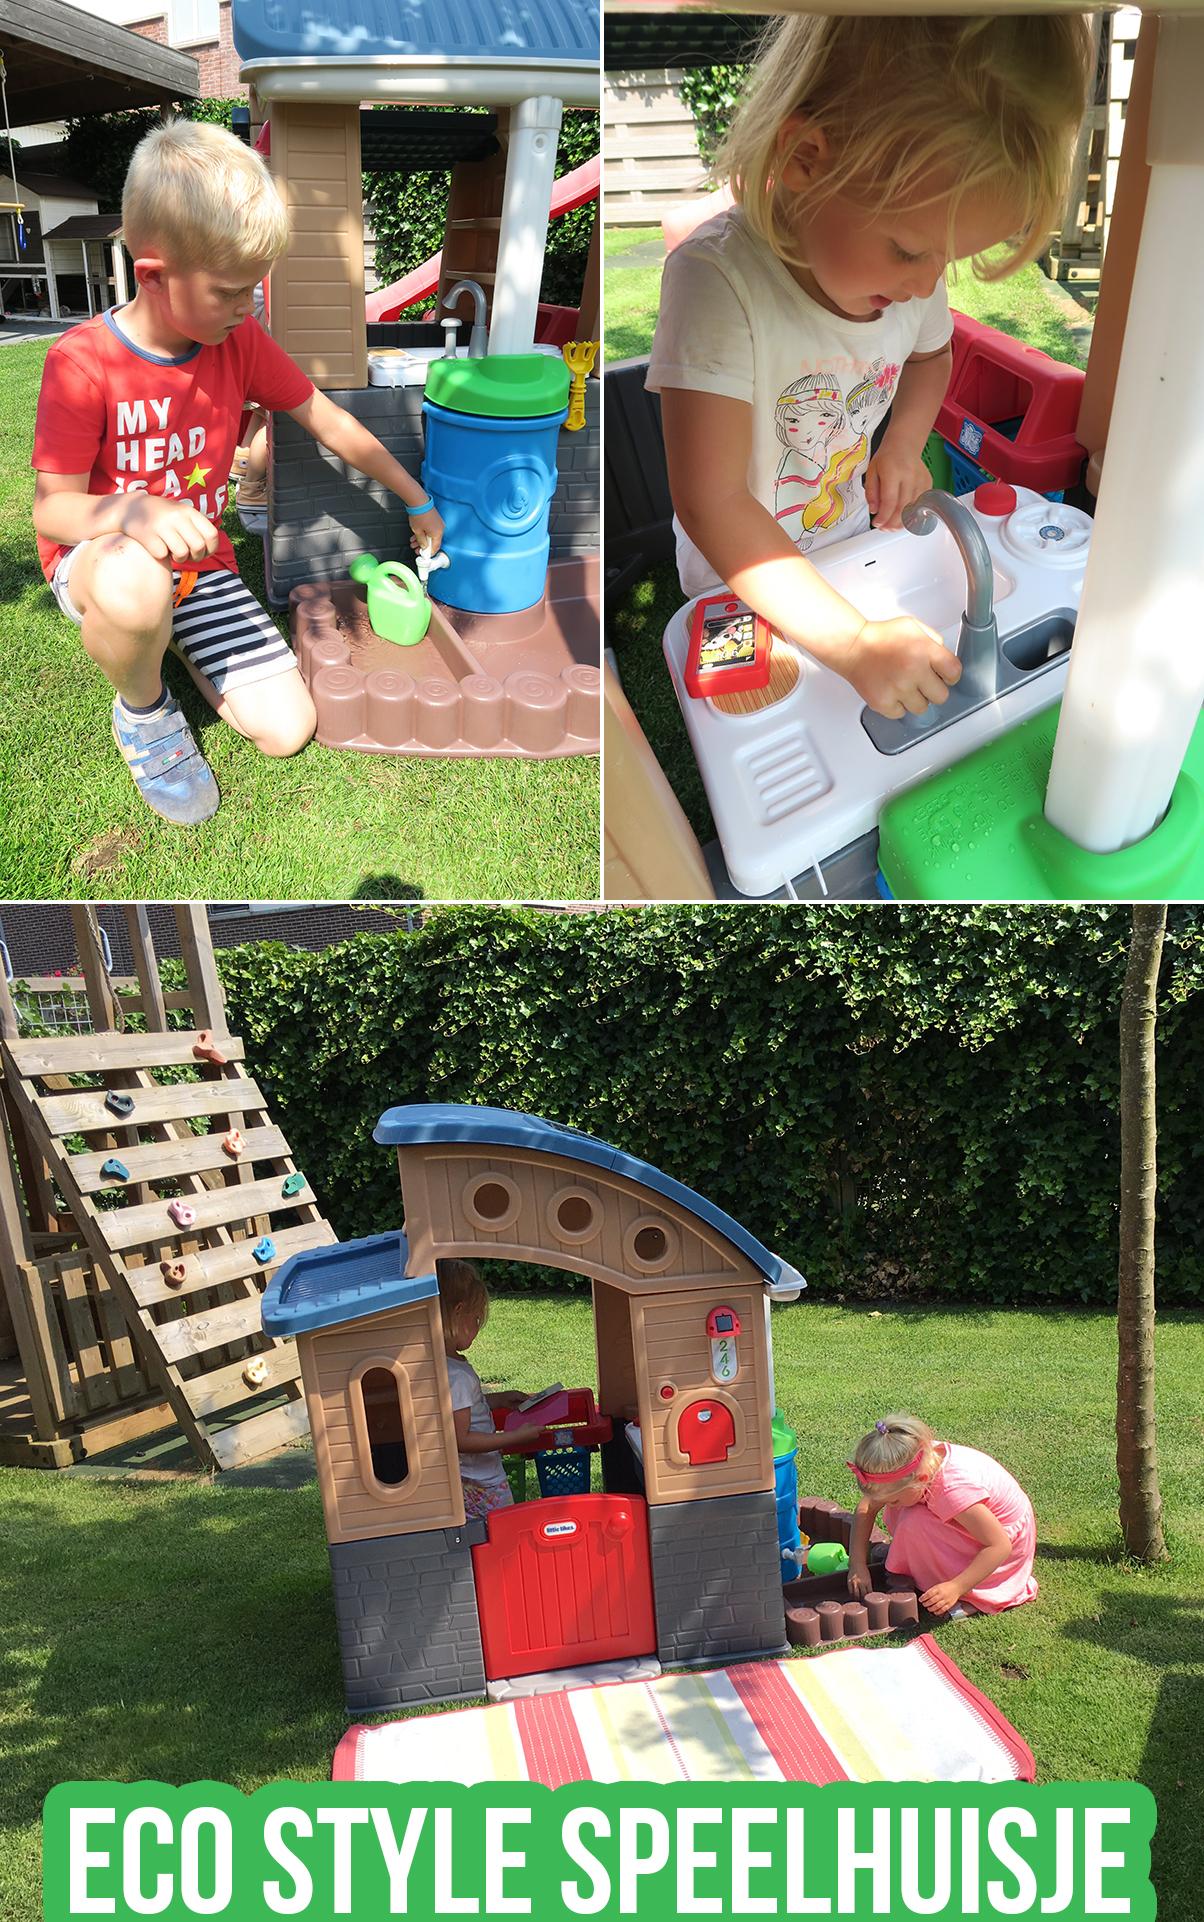 Eco style speelhuisje